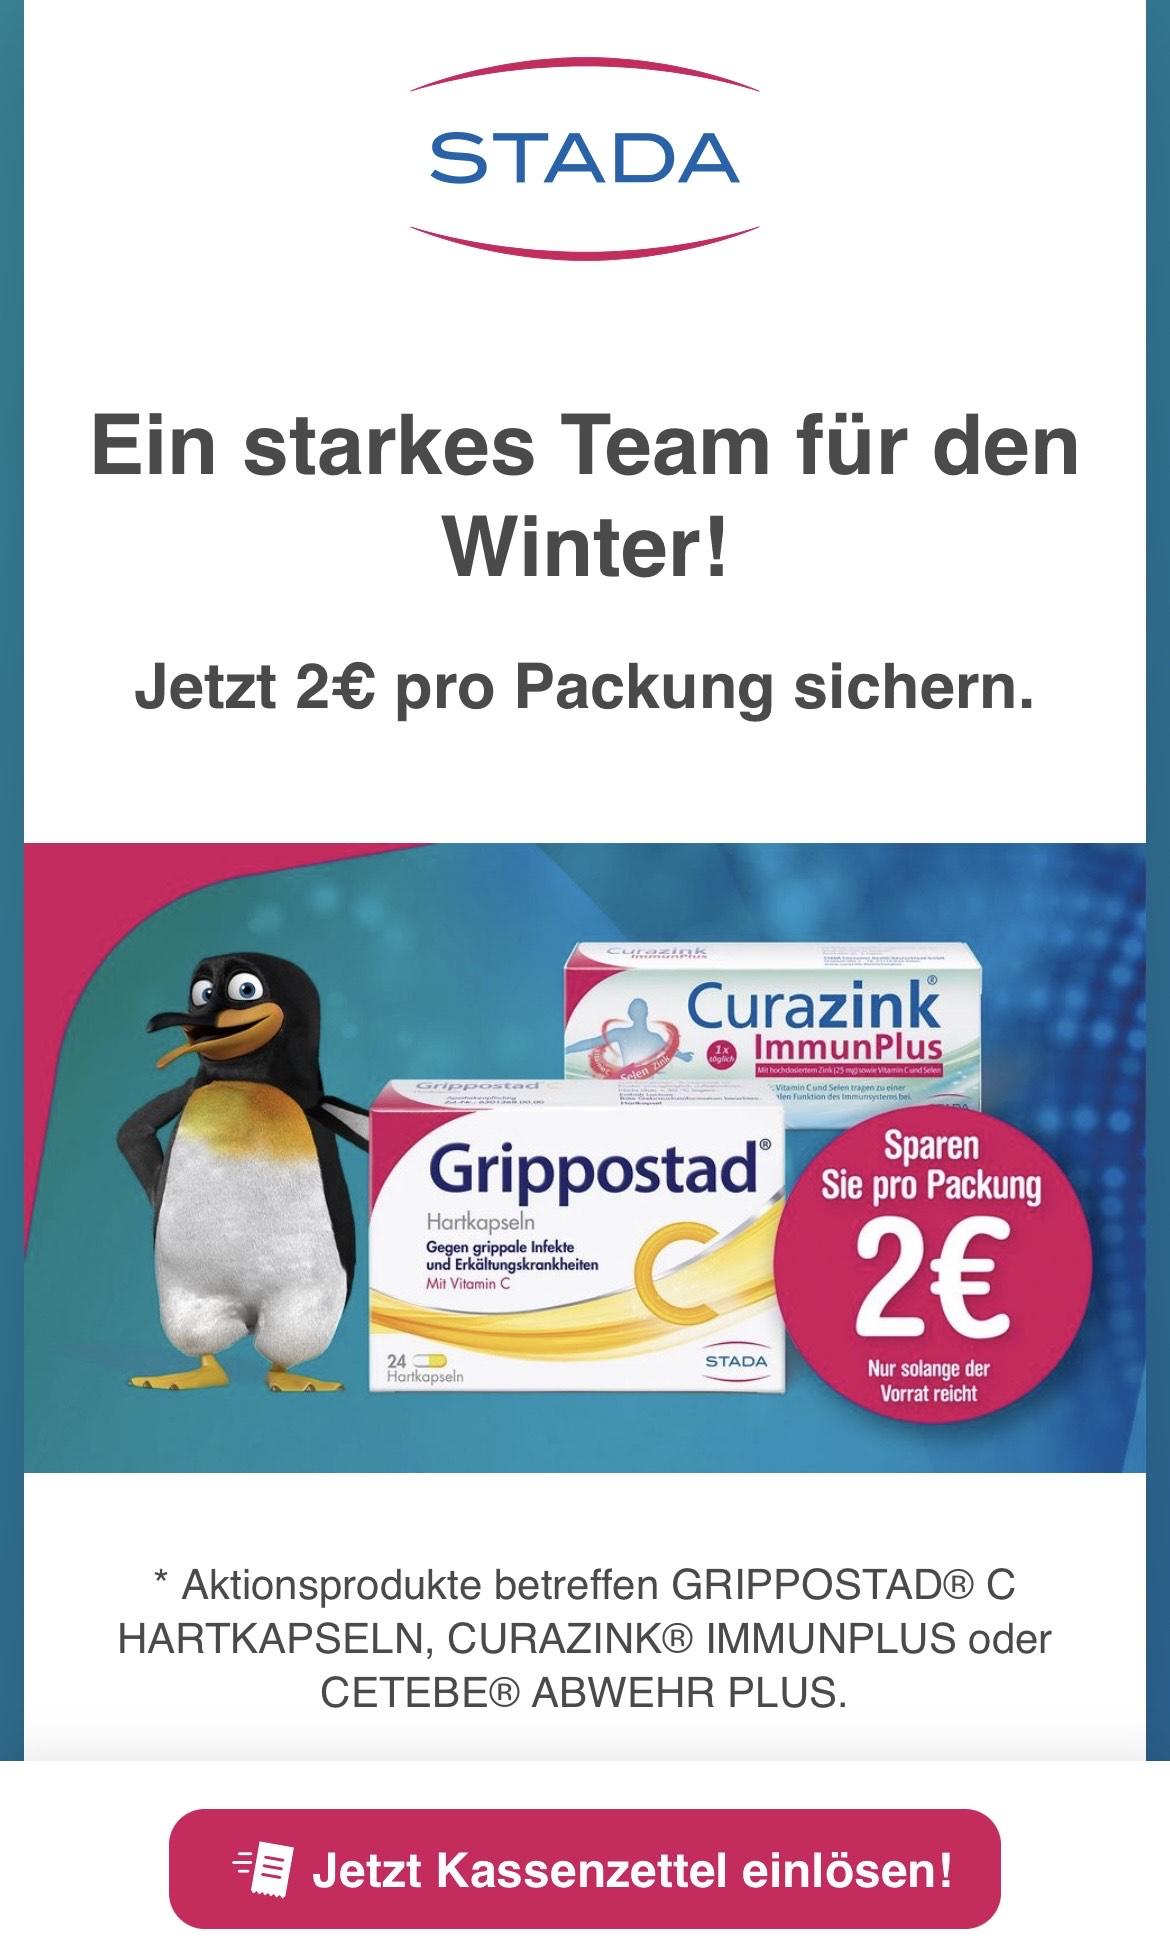 Grippostad Cetebe & Curazink Sparaktion Cashback